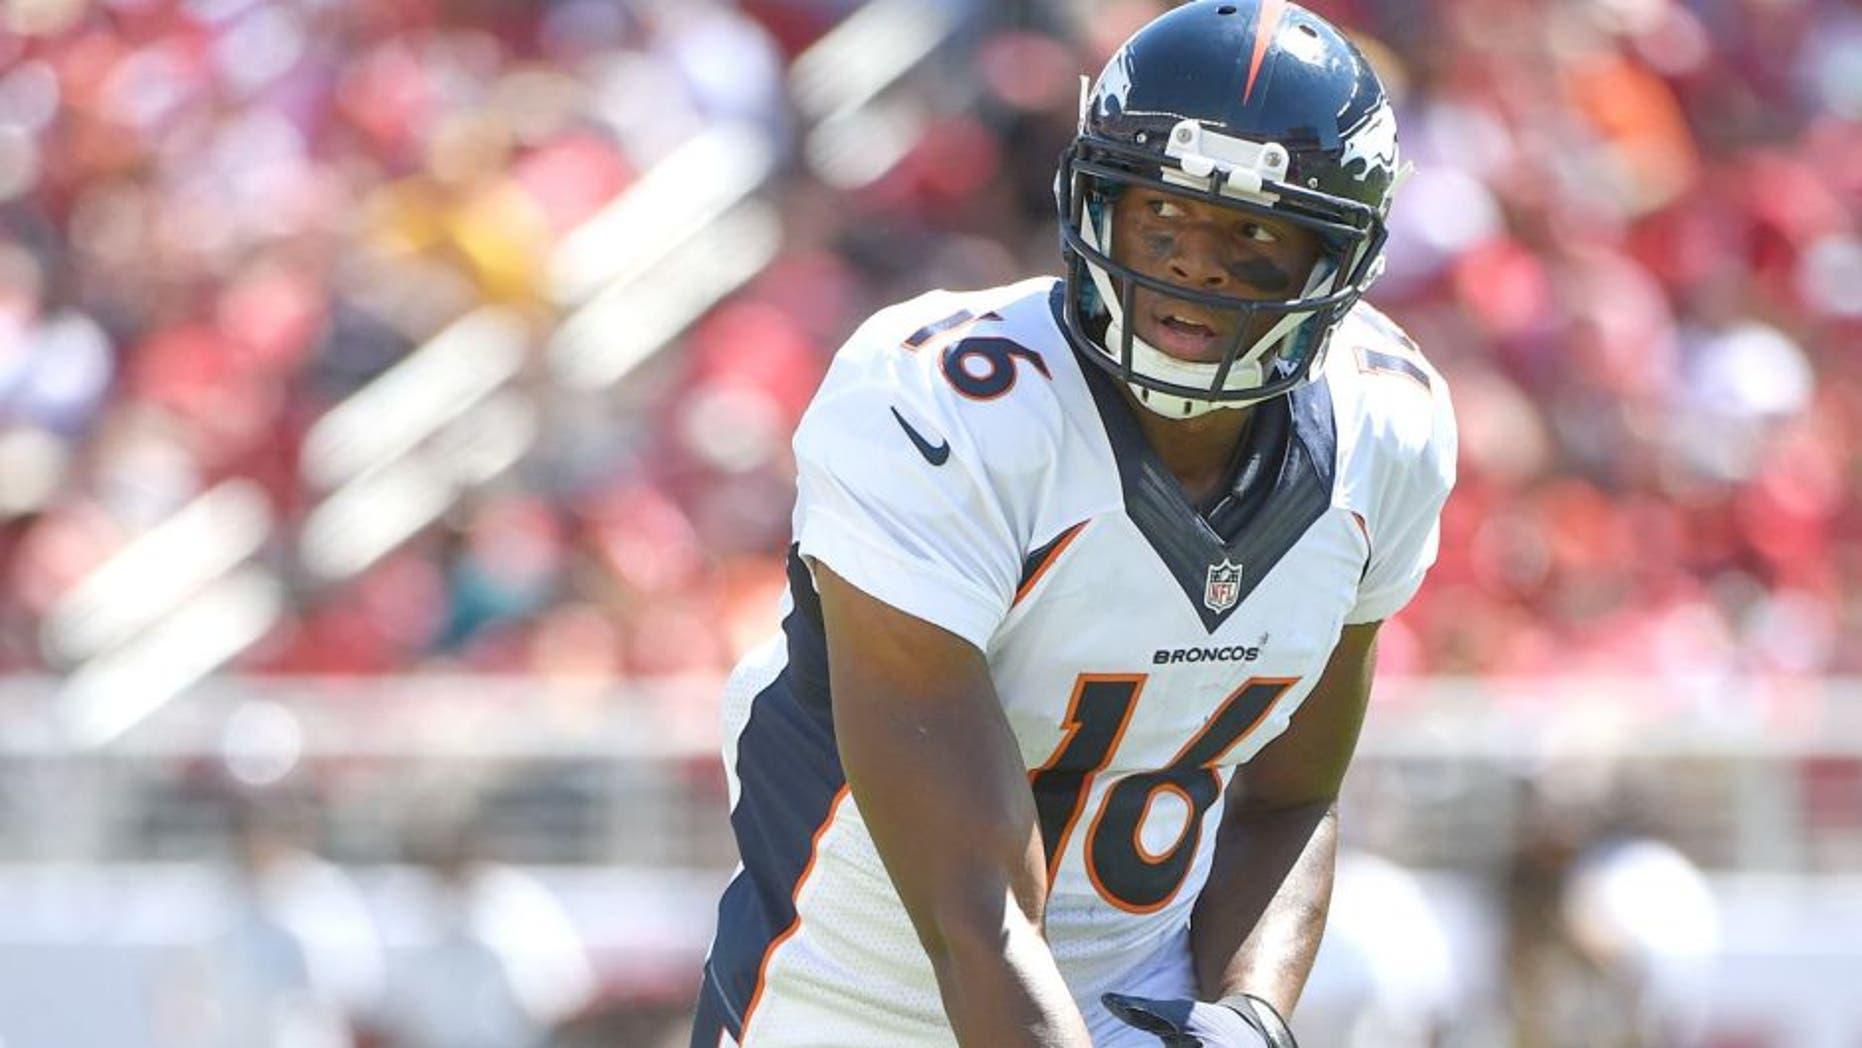 August 17, 2014; Santa Clara, CA, USA; Denver Broncos wide receiver Bennie Fowler (16) during the third quarter against the San Francisco 49ers at Levi's Stadium. The Broncos defeated the 49ers 34-0. Mandatory Credit: Kyle Terada-USA TODAY Sports